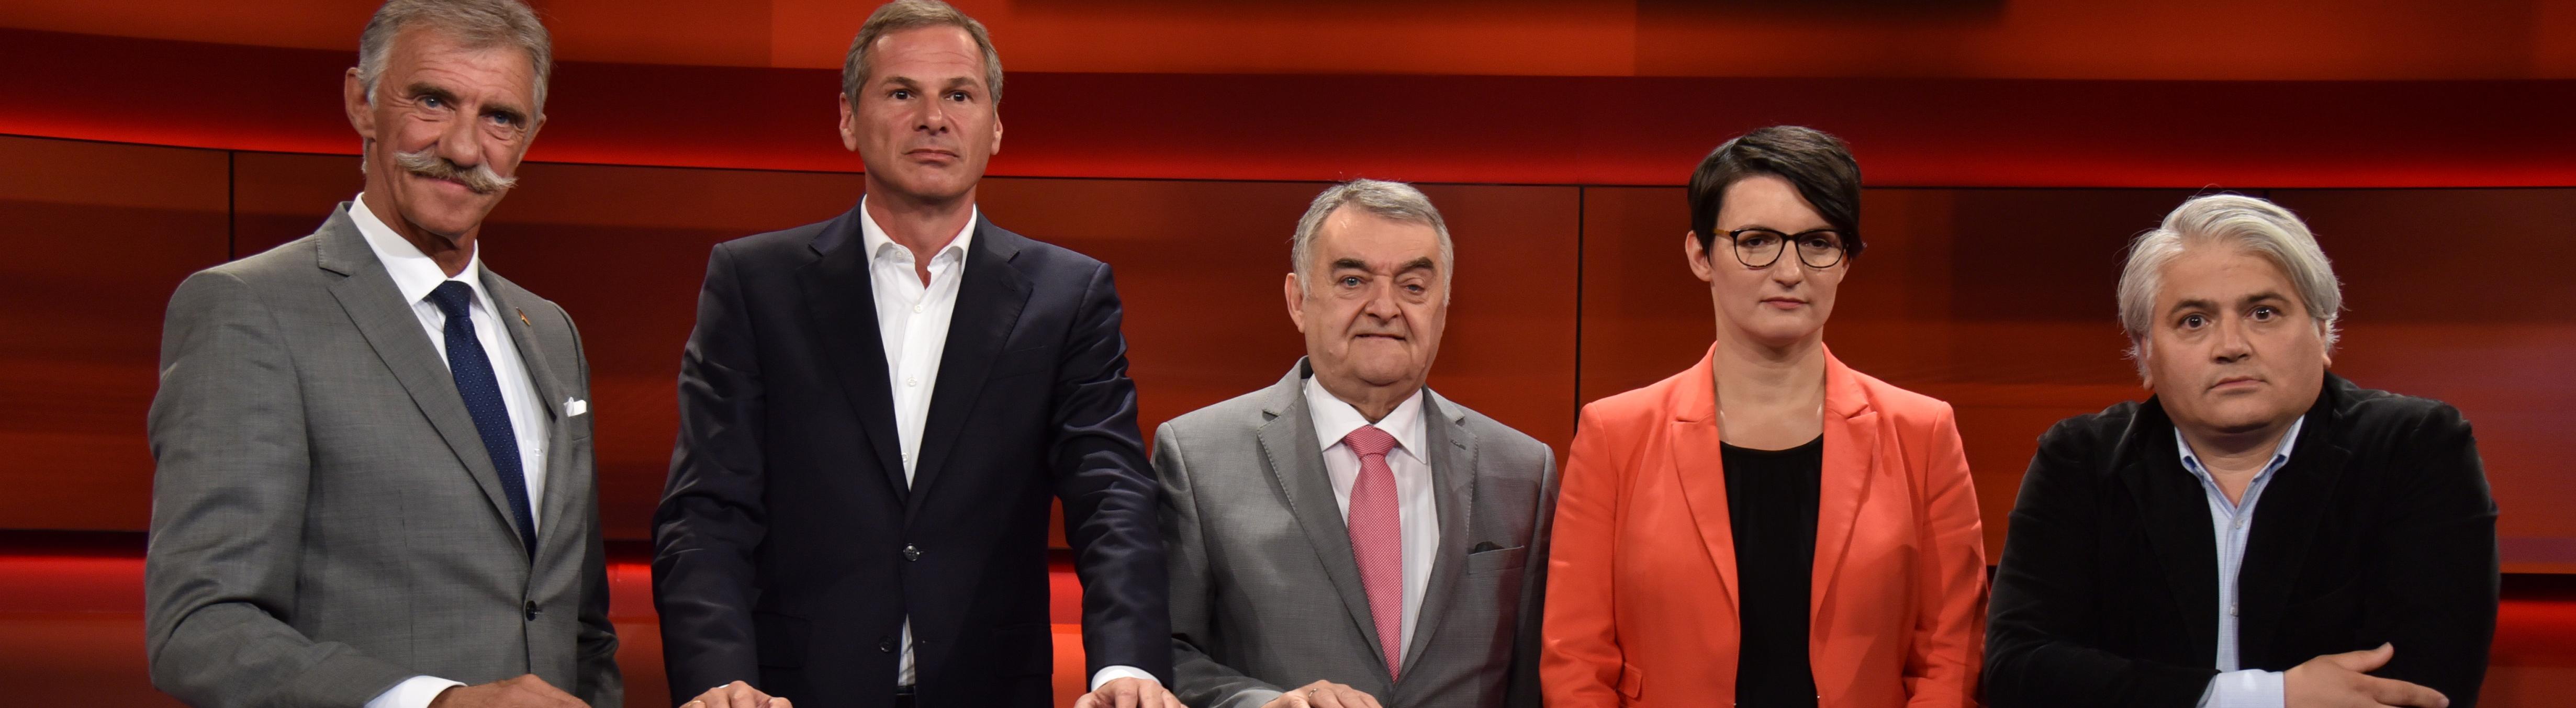 "Talkshow ""Hart aber Fair"" am 1.7.2019 mit AfD-Politiker Uwe Jung,  Georg Mascolo, Herbert Reul, Irene Mihalic und Mehmet Daimagüler"